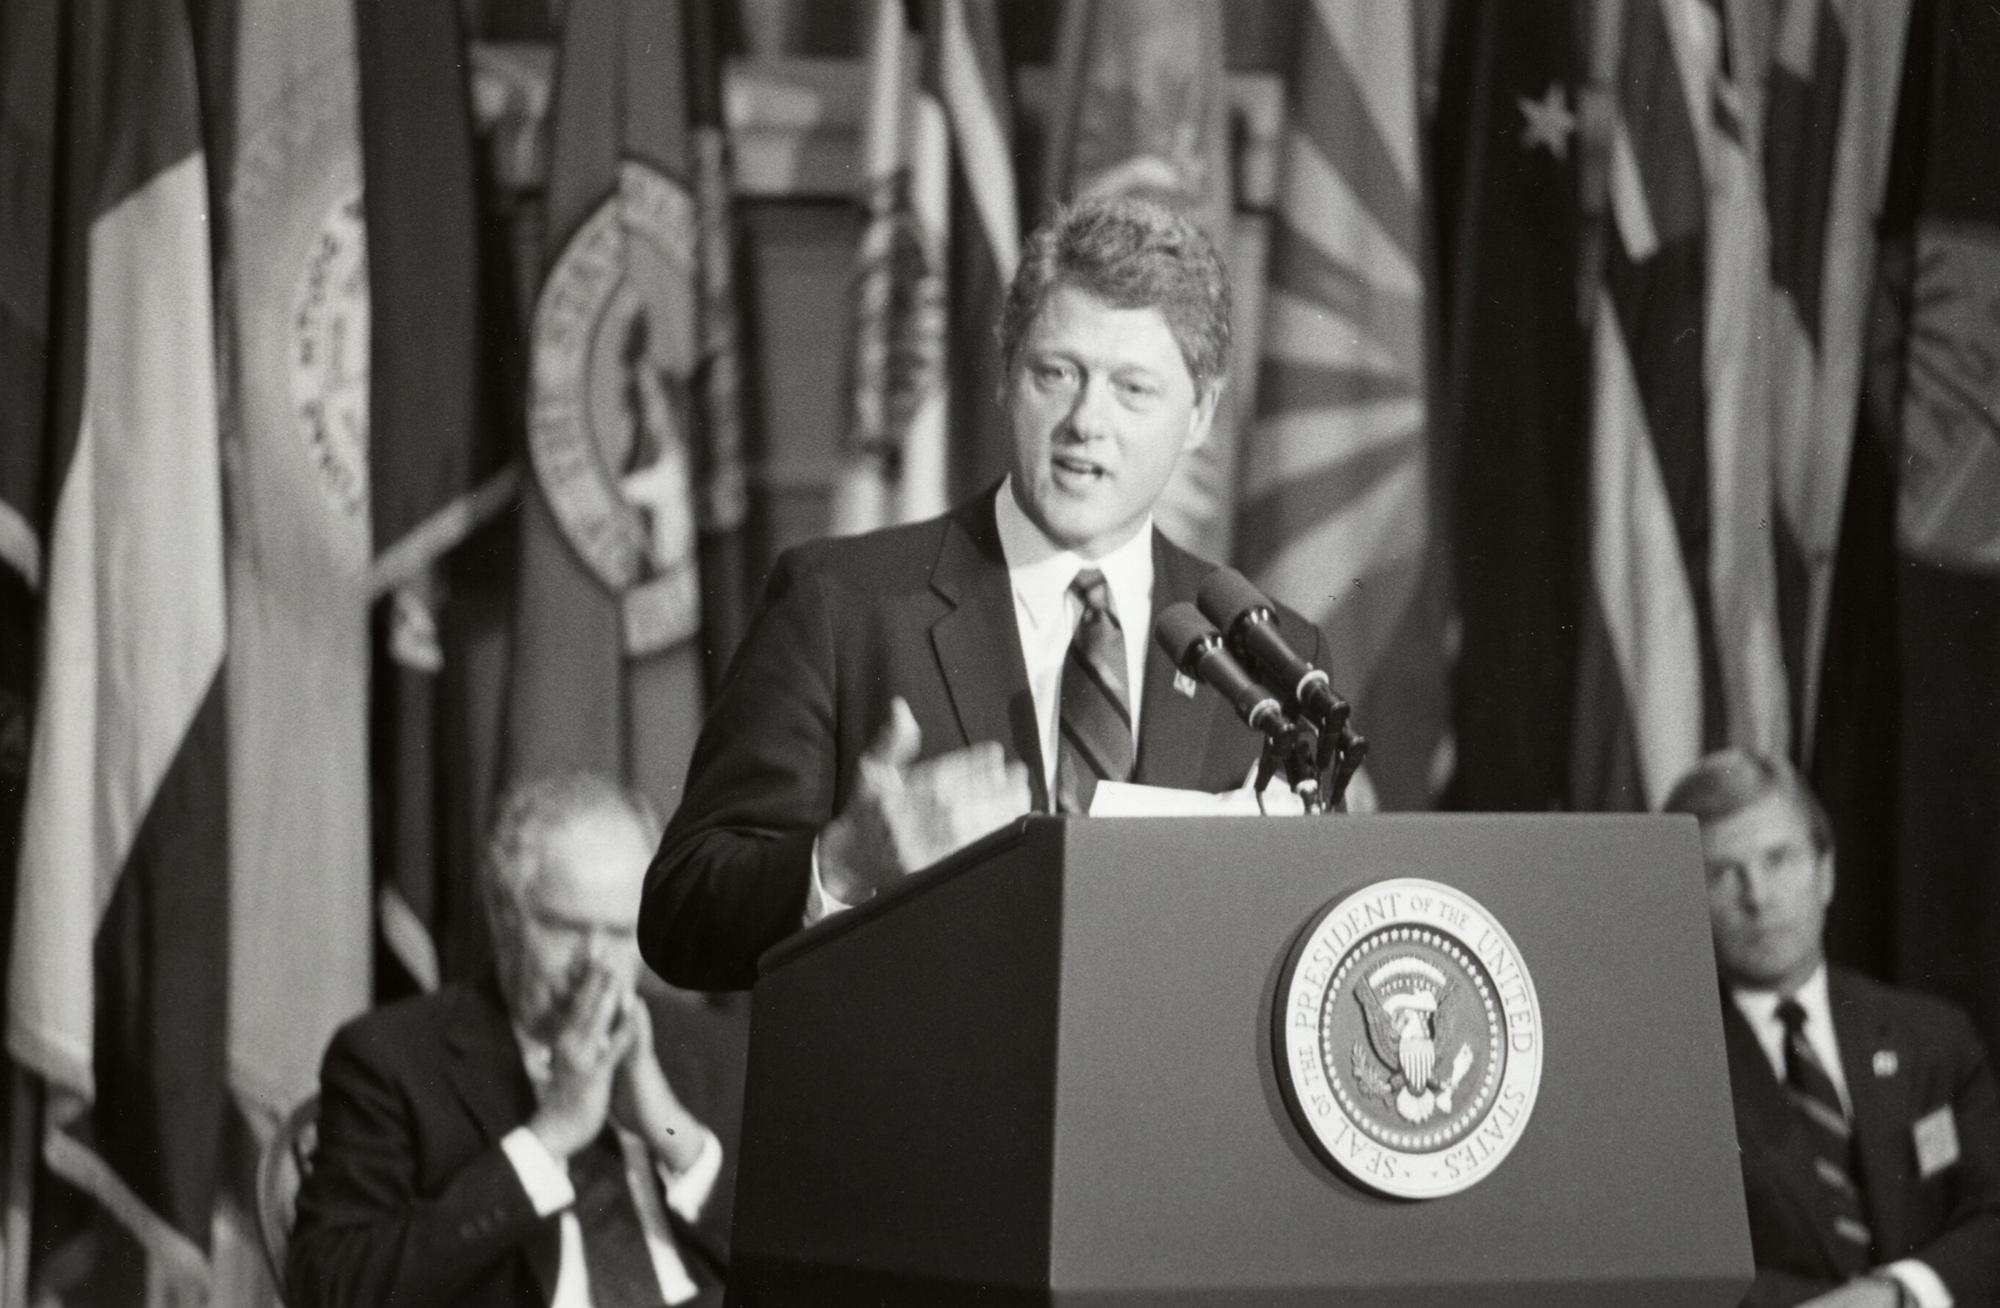 President Clinton at UVA